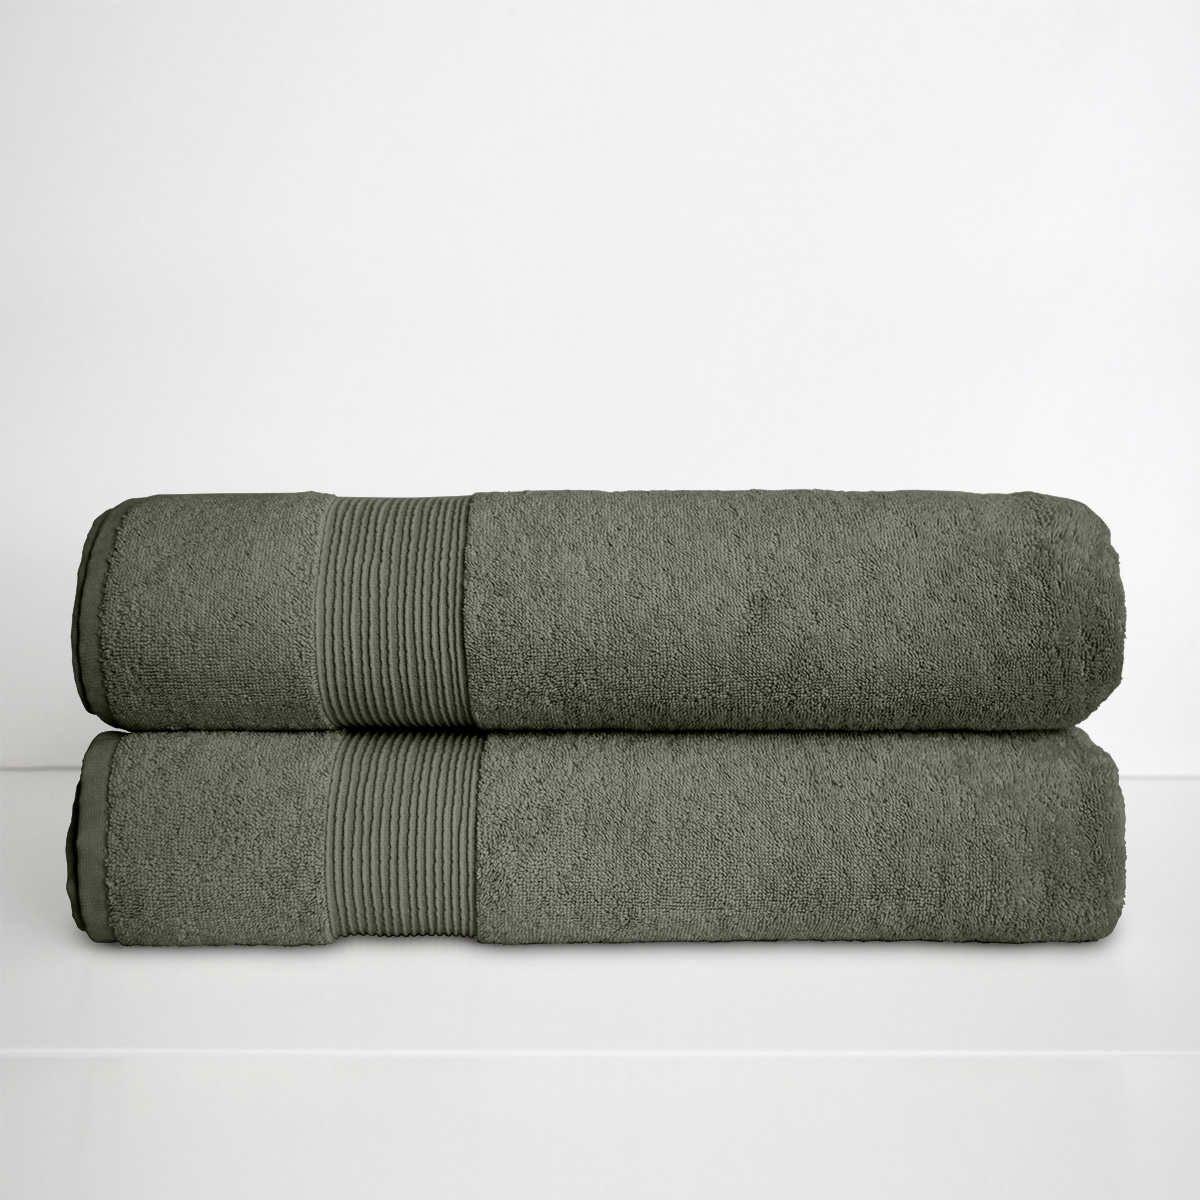 7b3d8a62ec62 Signature Collection 2-piece Bath Sheet Set | Towels | Bath sheets ...